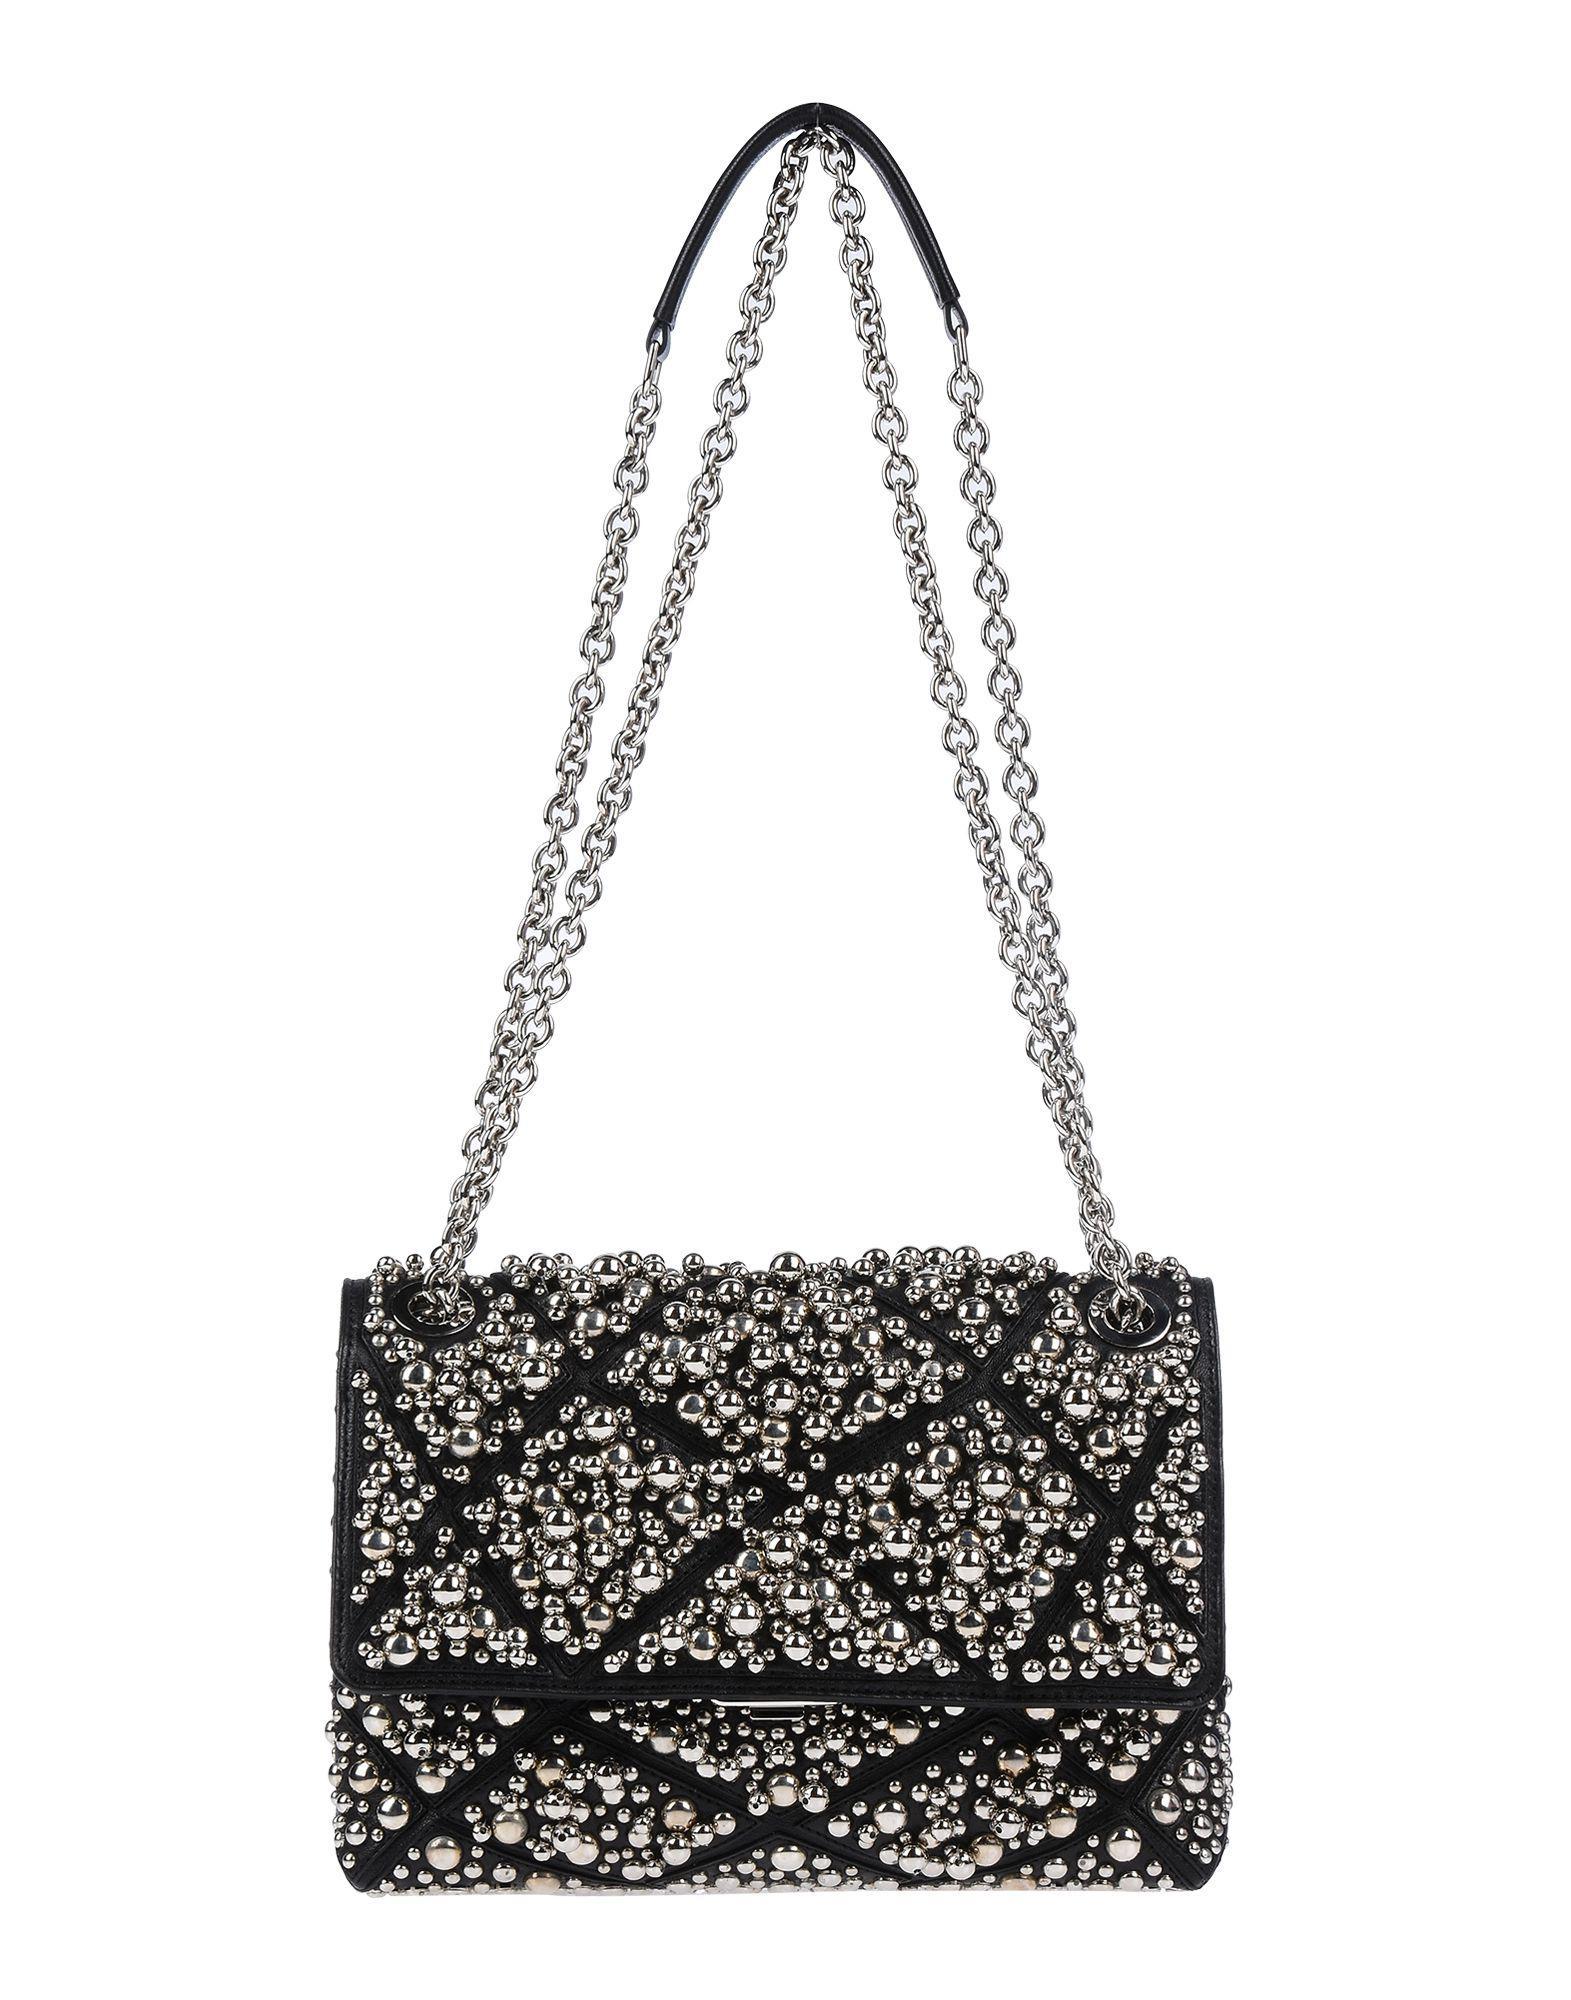 Lyst - Roger Vivier Cross-body Bag in Black e04eb2203e8ad